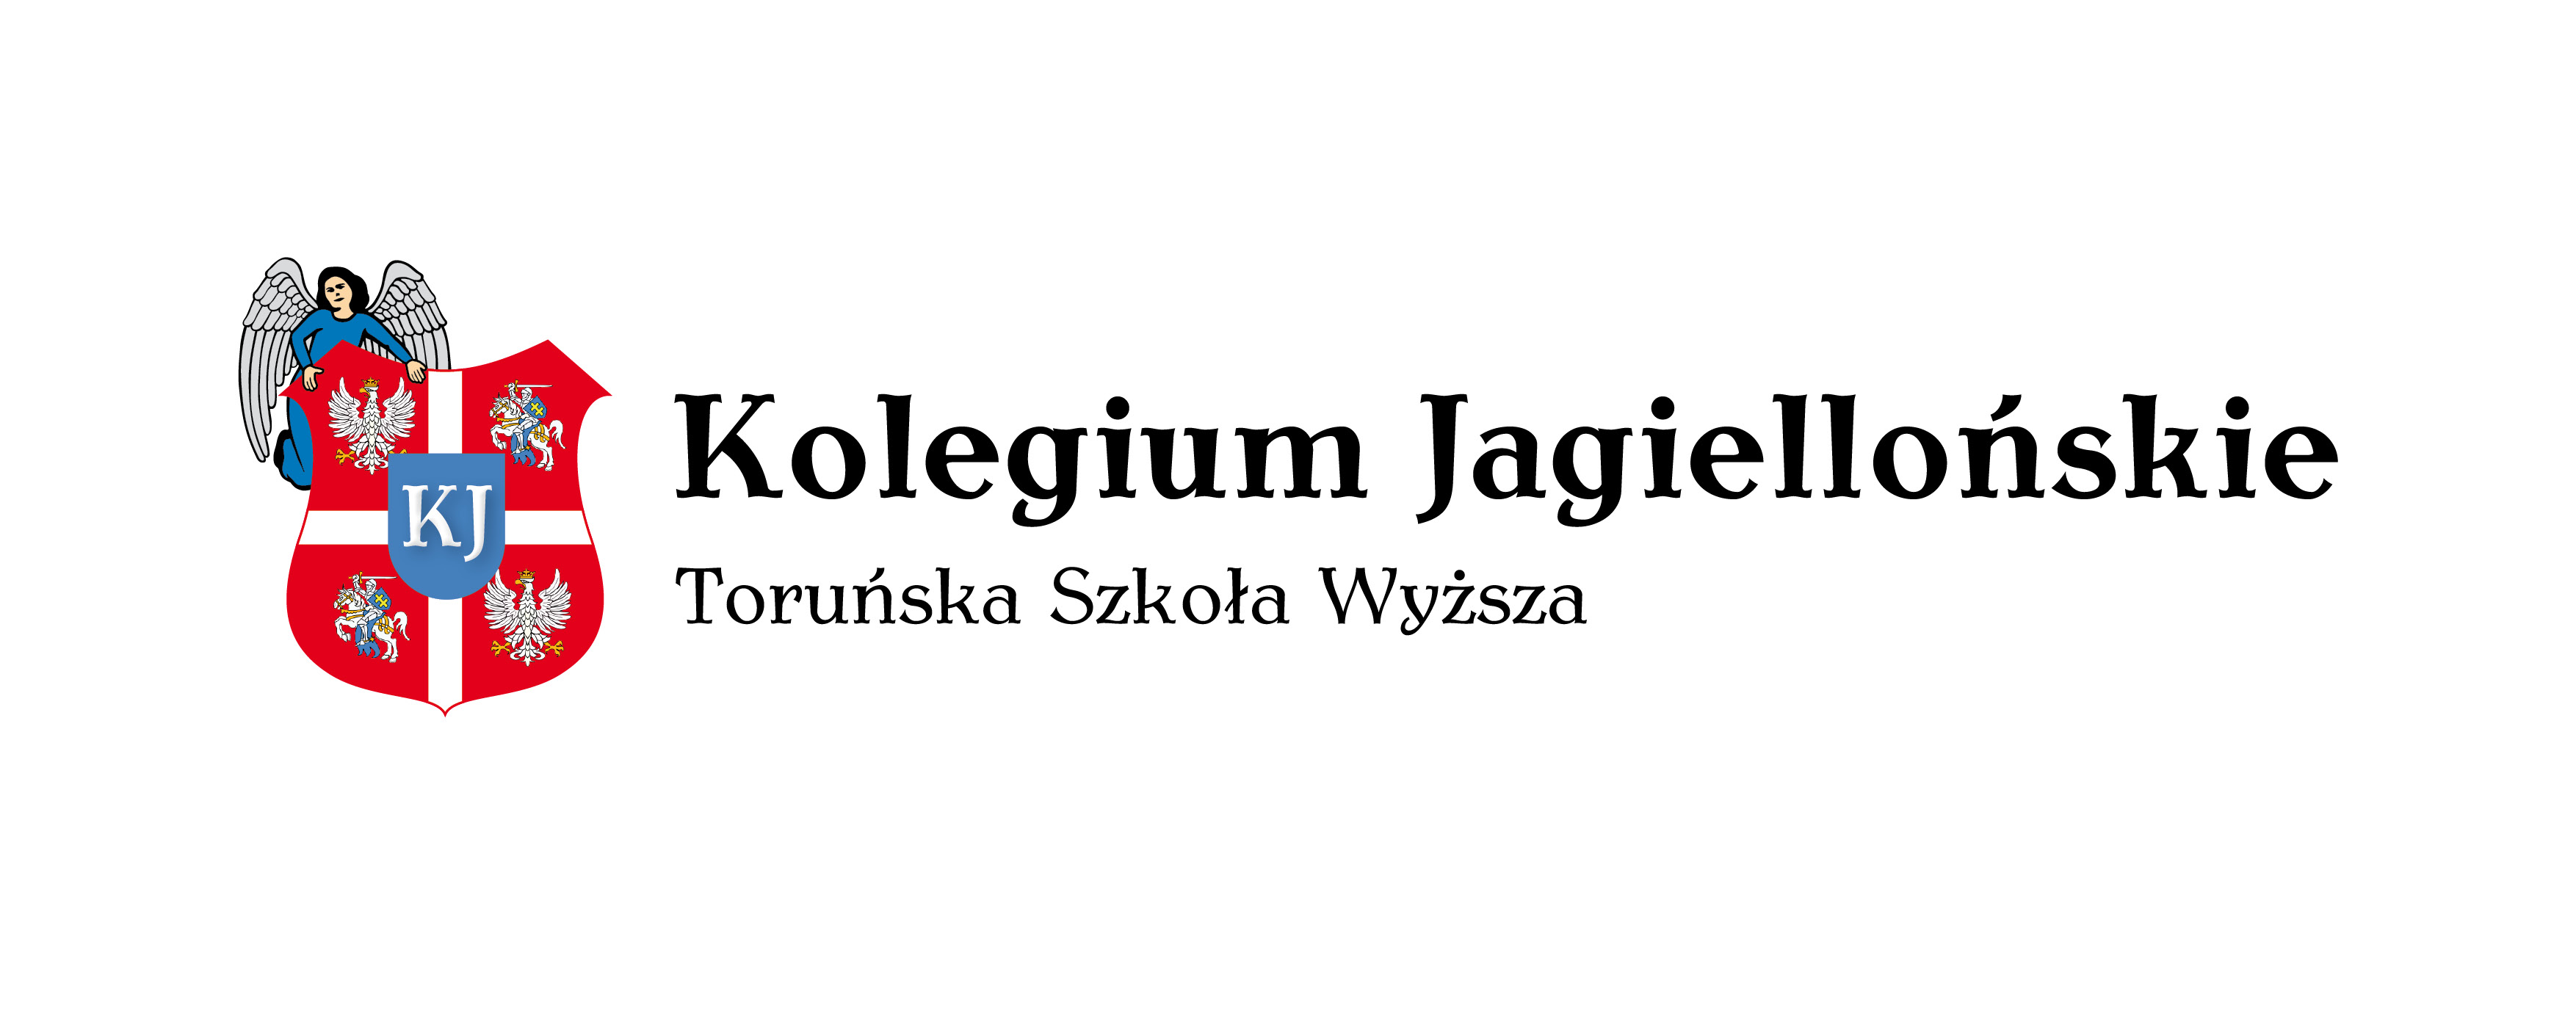 Logo Kolegium Jagiellońskie - Toruńska Szkoła Wyższa